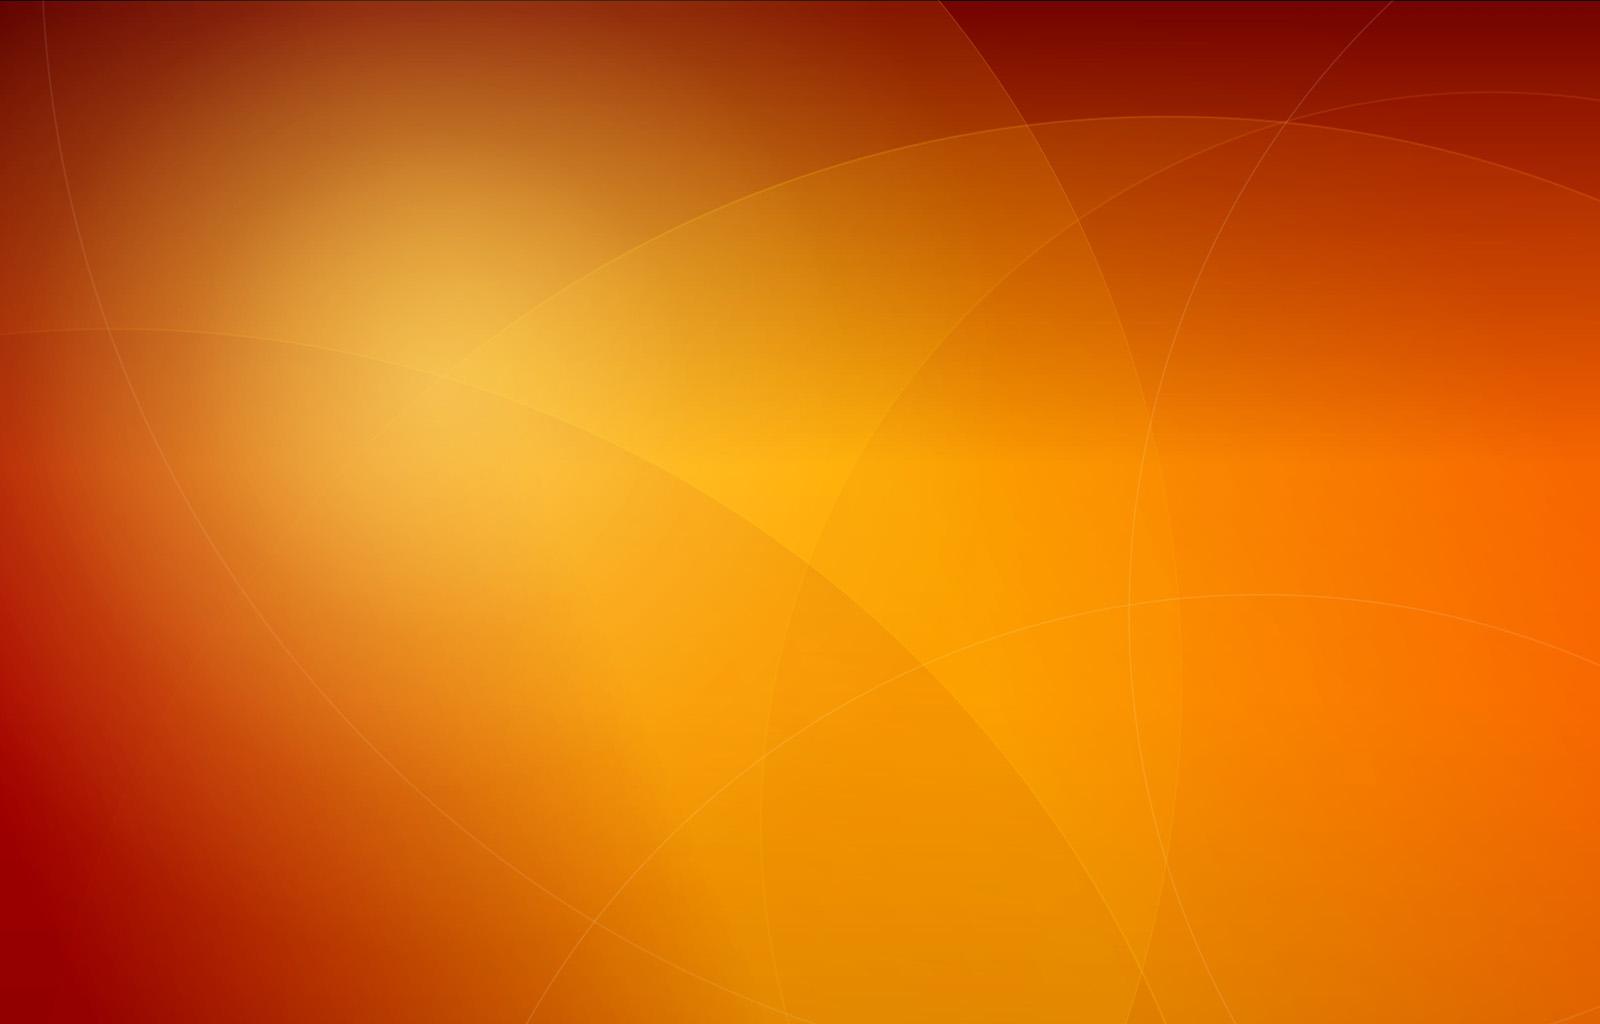 Orange   Orange Photo 774527 1600x1024